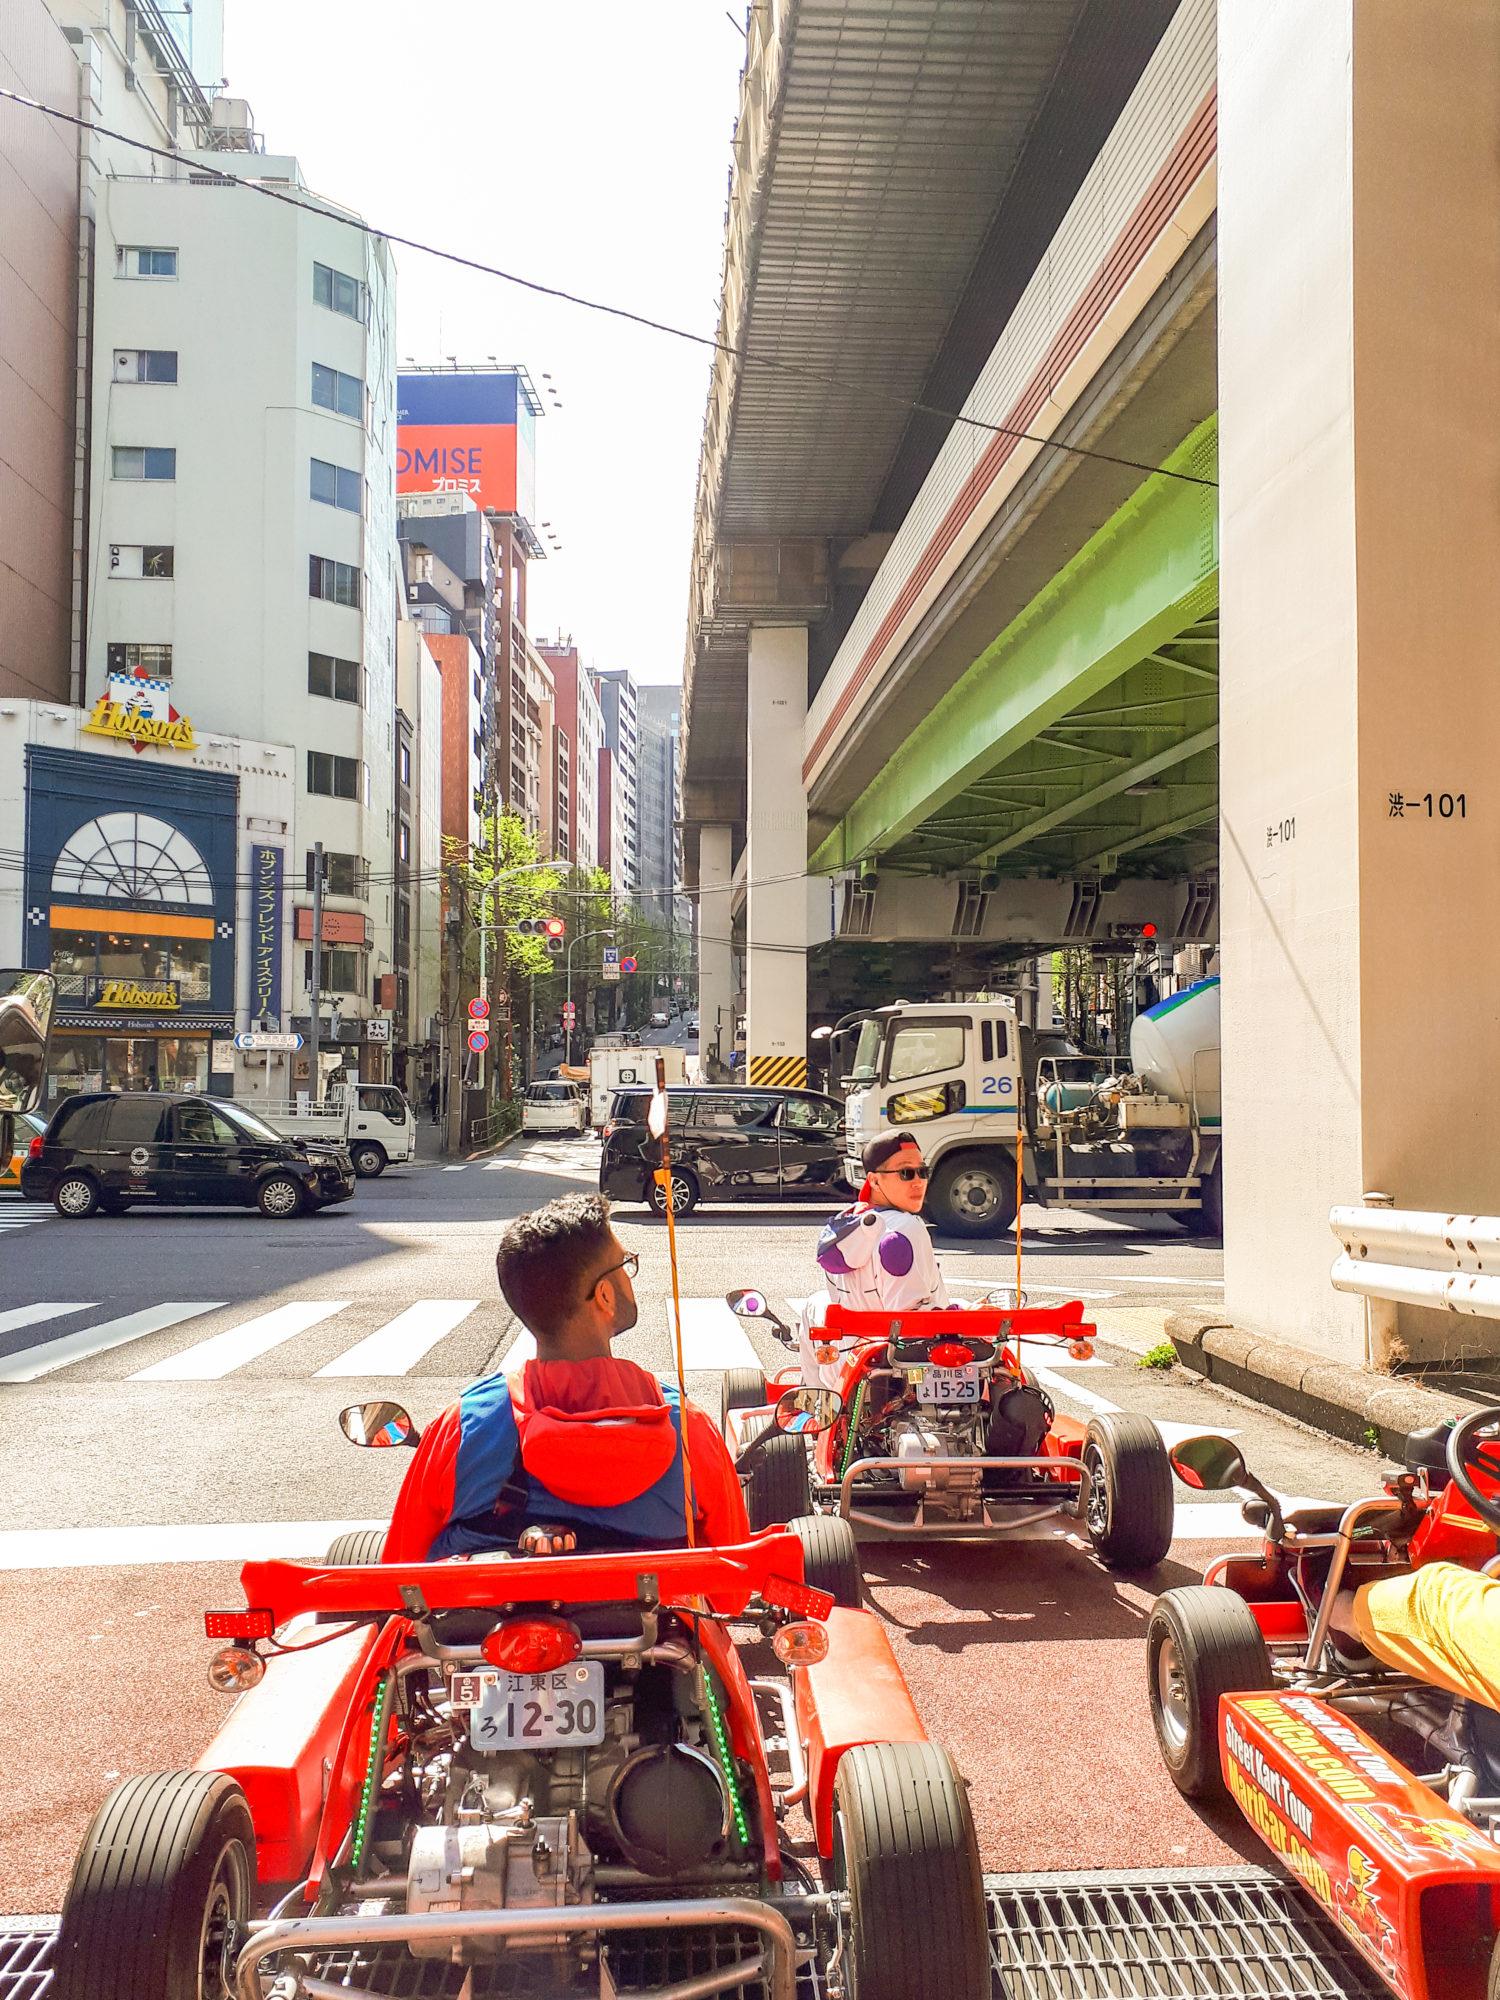 Real Life Mario Kart, Roppongi